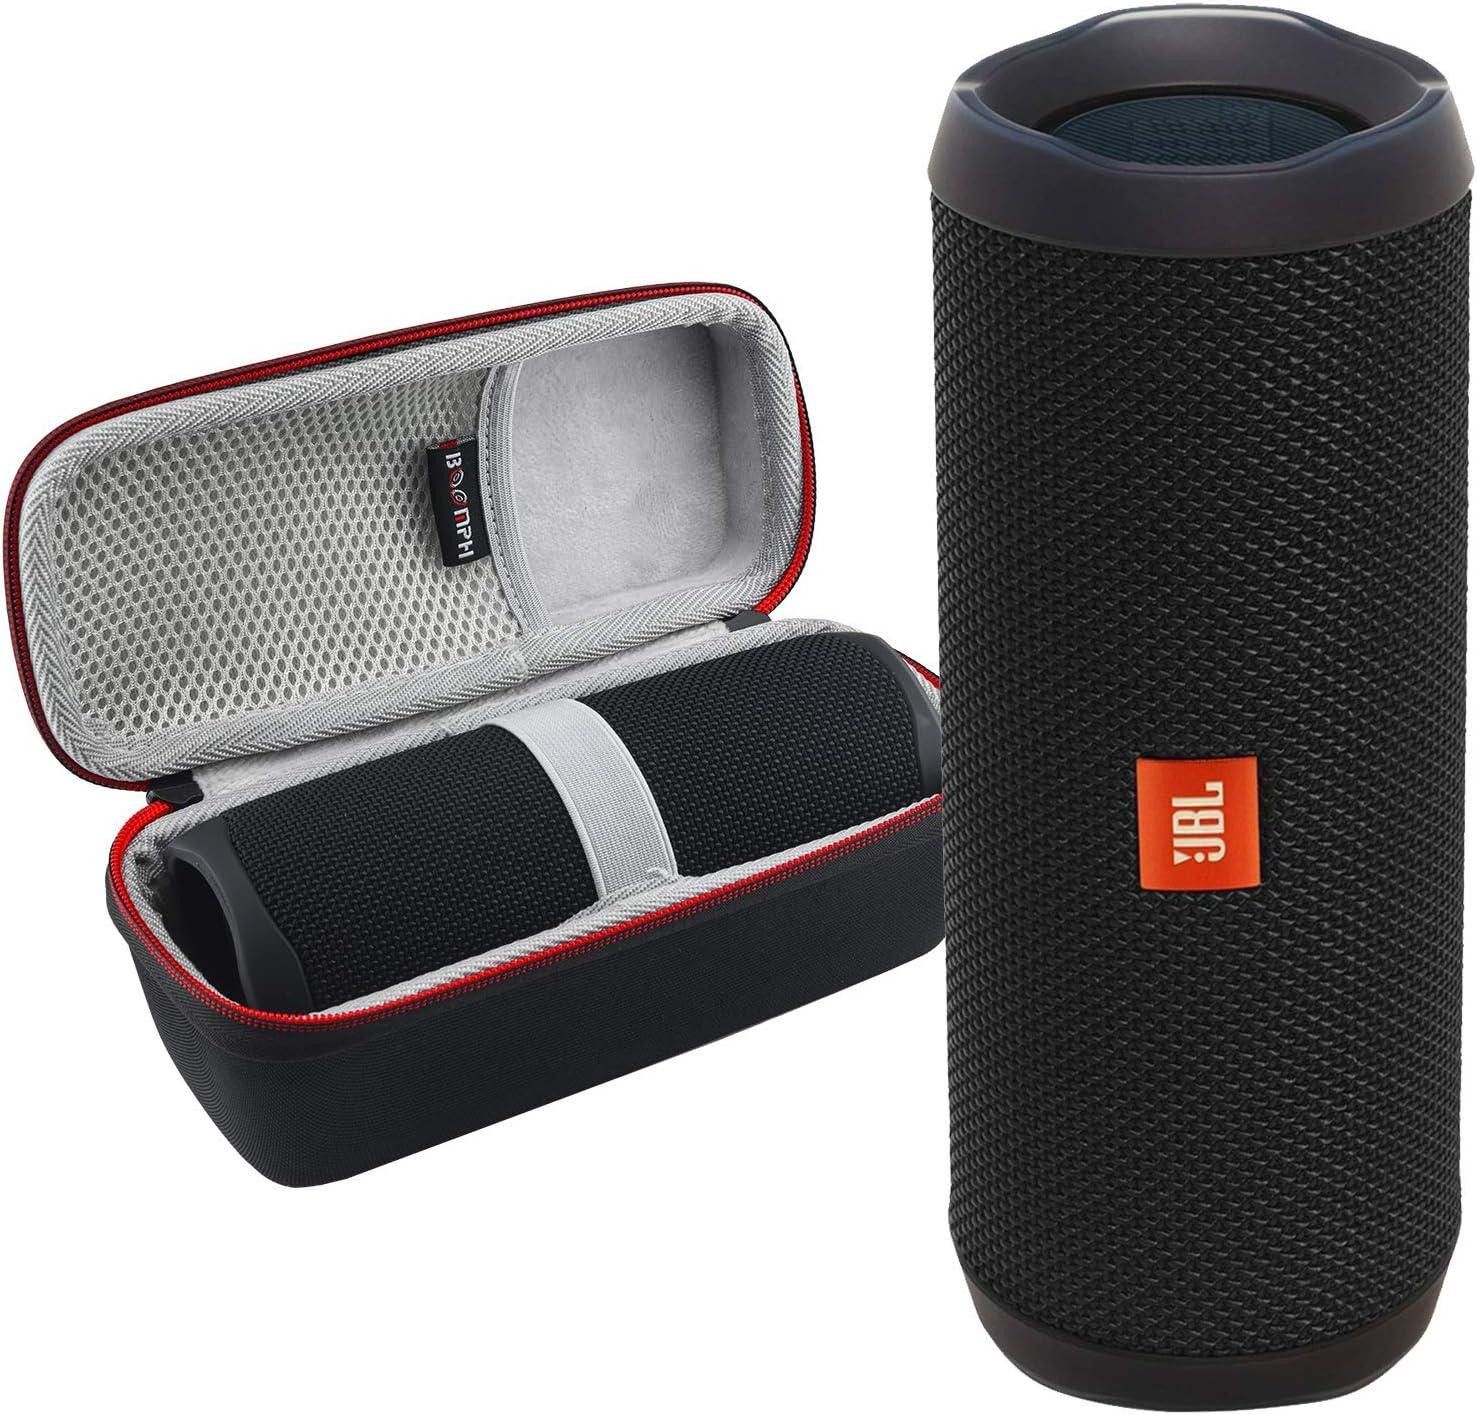 Bluetooth-Kopfh/örer 5.0,Kabellose Kopfh/örer IPX7 wasserdichte,Noise-Cancelling-Kopfh/örer,Ger/äuschisolierung,mit 24H Ladek/ästchen und Mikrofon f/ür Android//iPhone//Samsung//Apple AirPods Pro